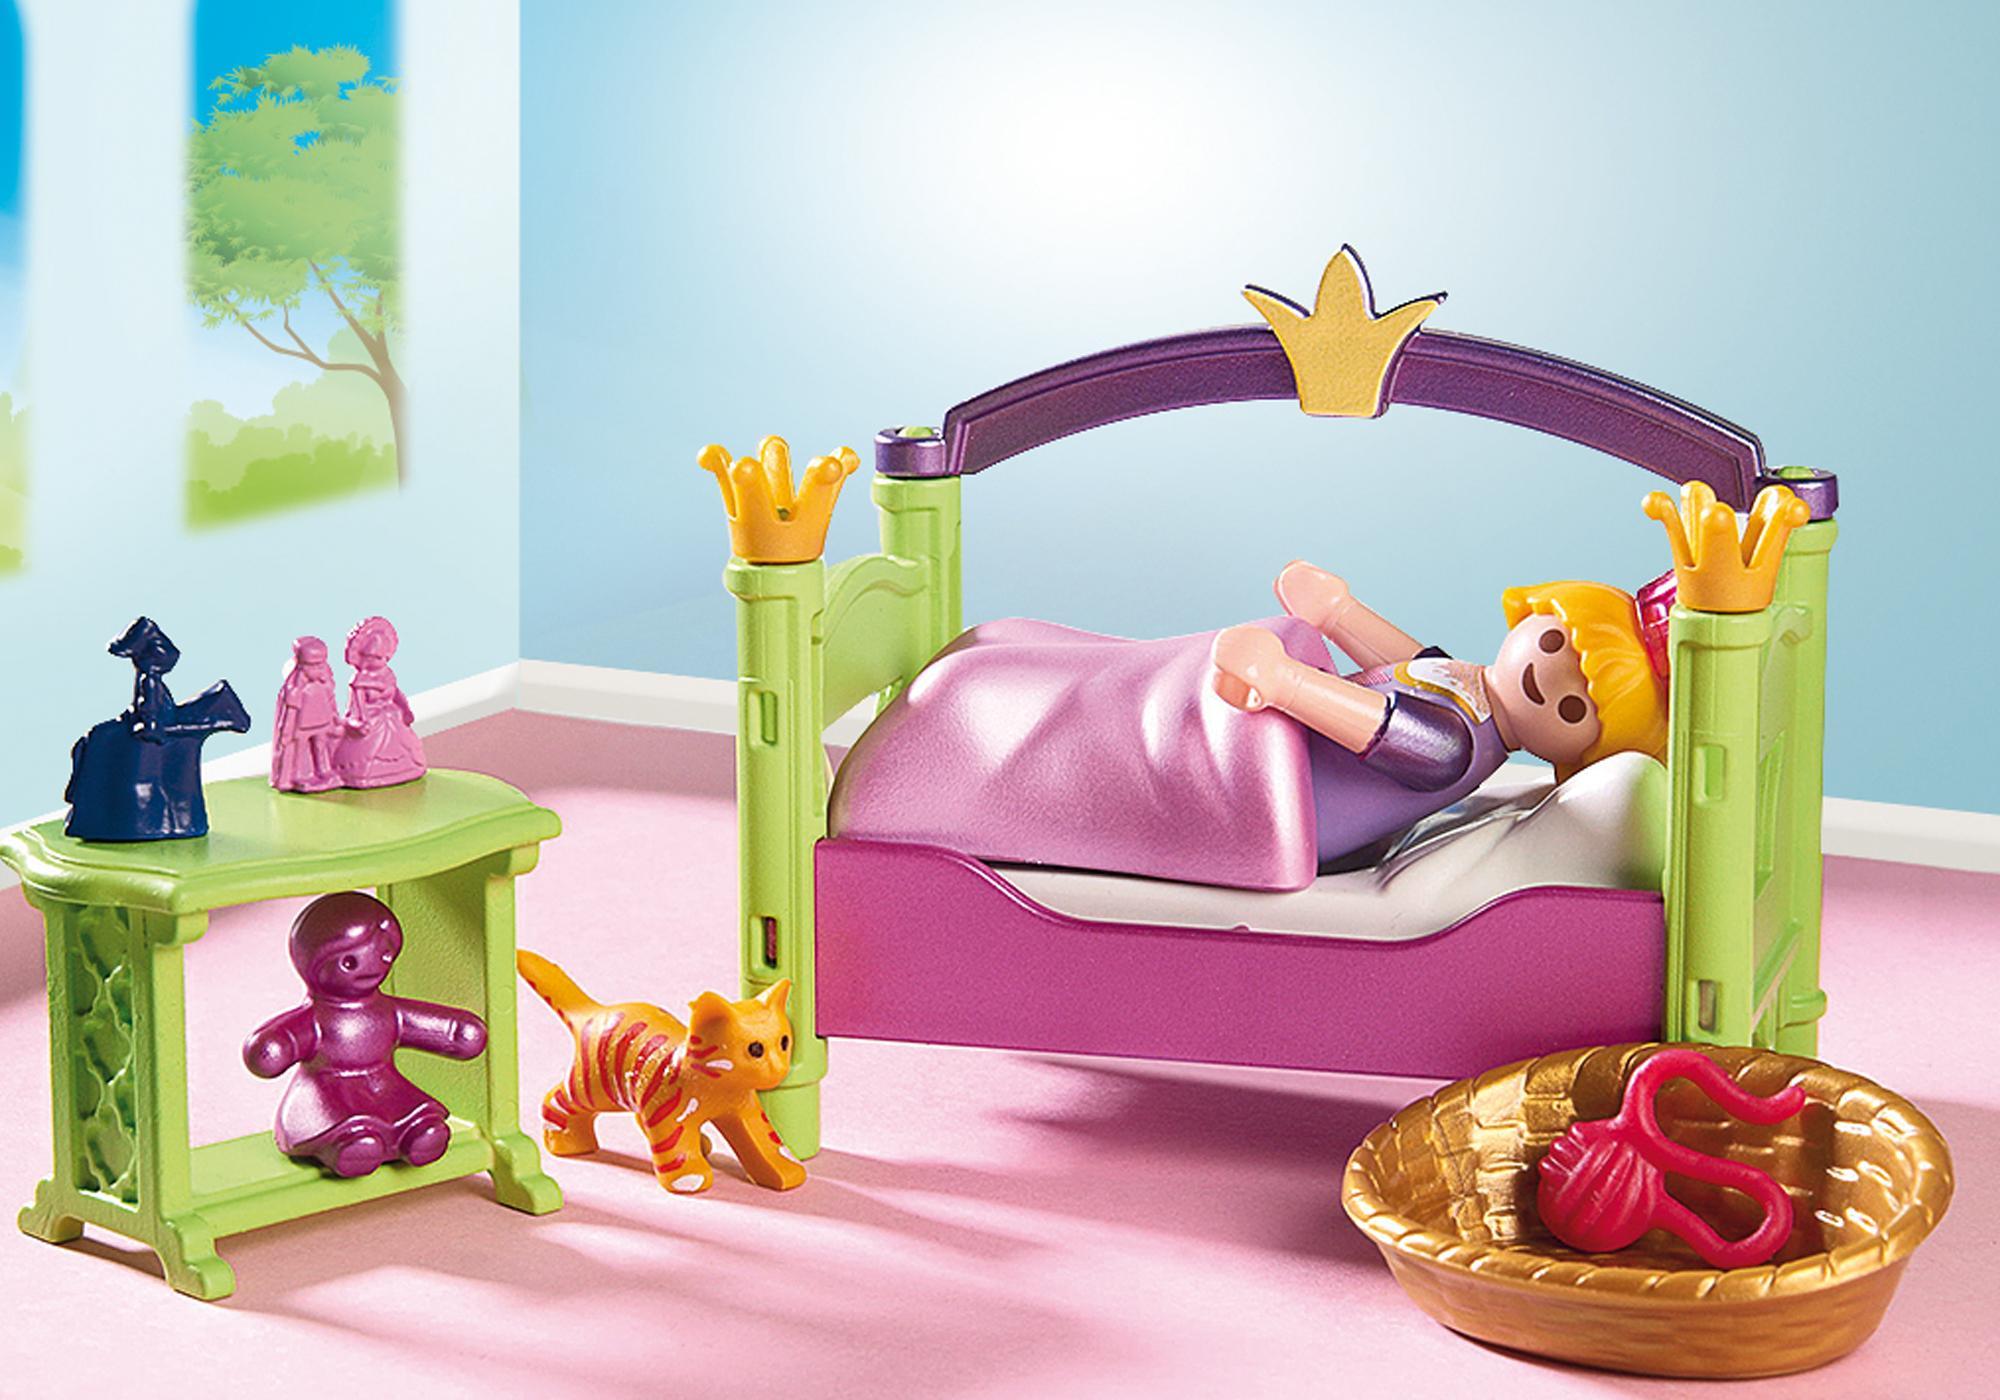 http://media.playmobil.com/i/playmobil/6852_product_extra1/Royal Nursery